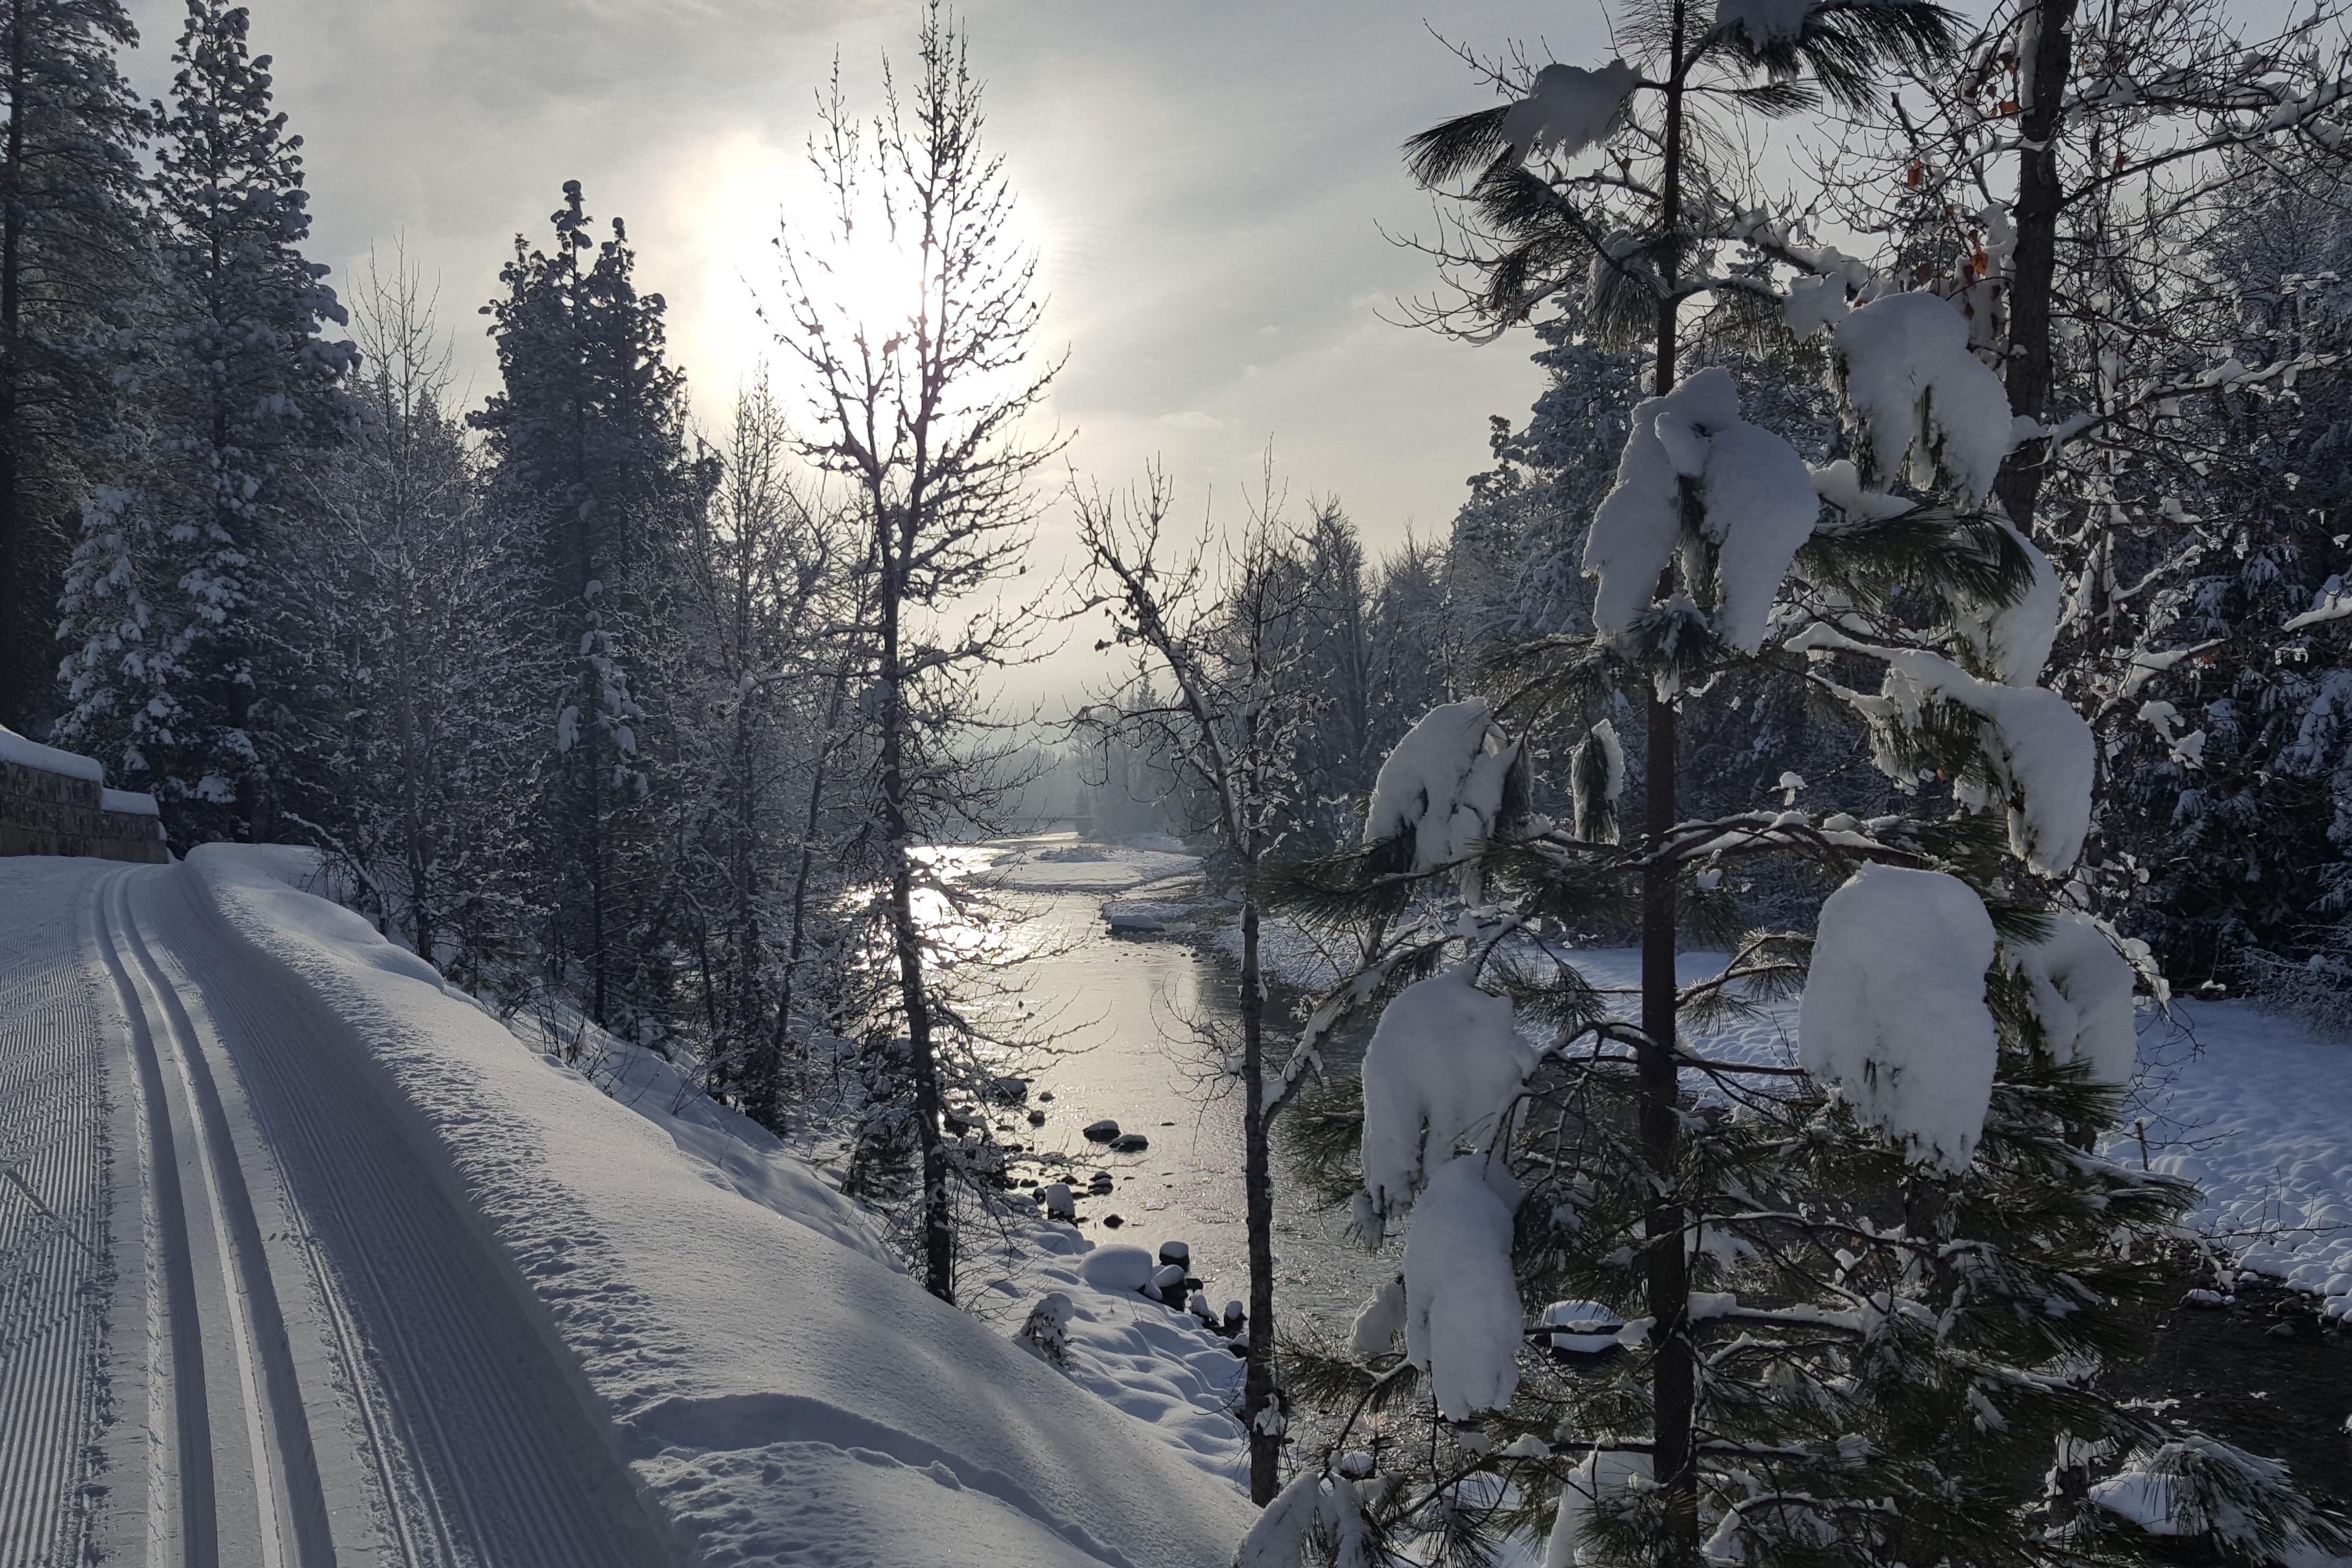 Ski tracks near Winthrop.